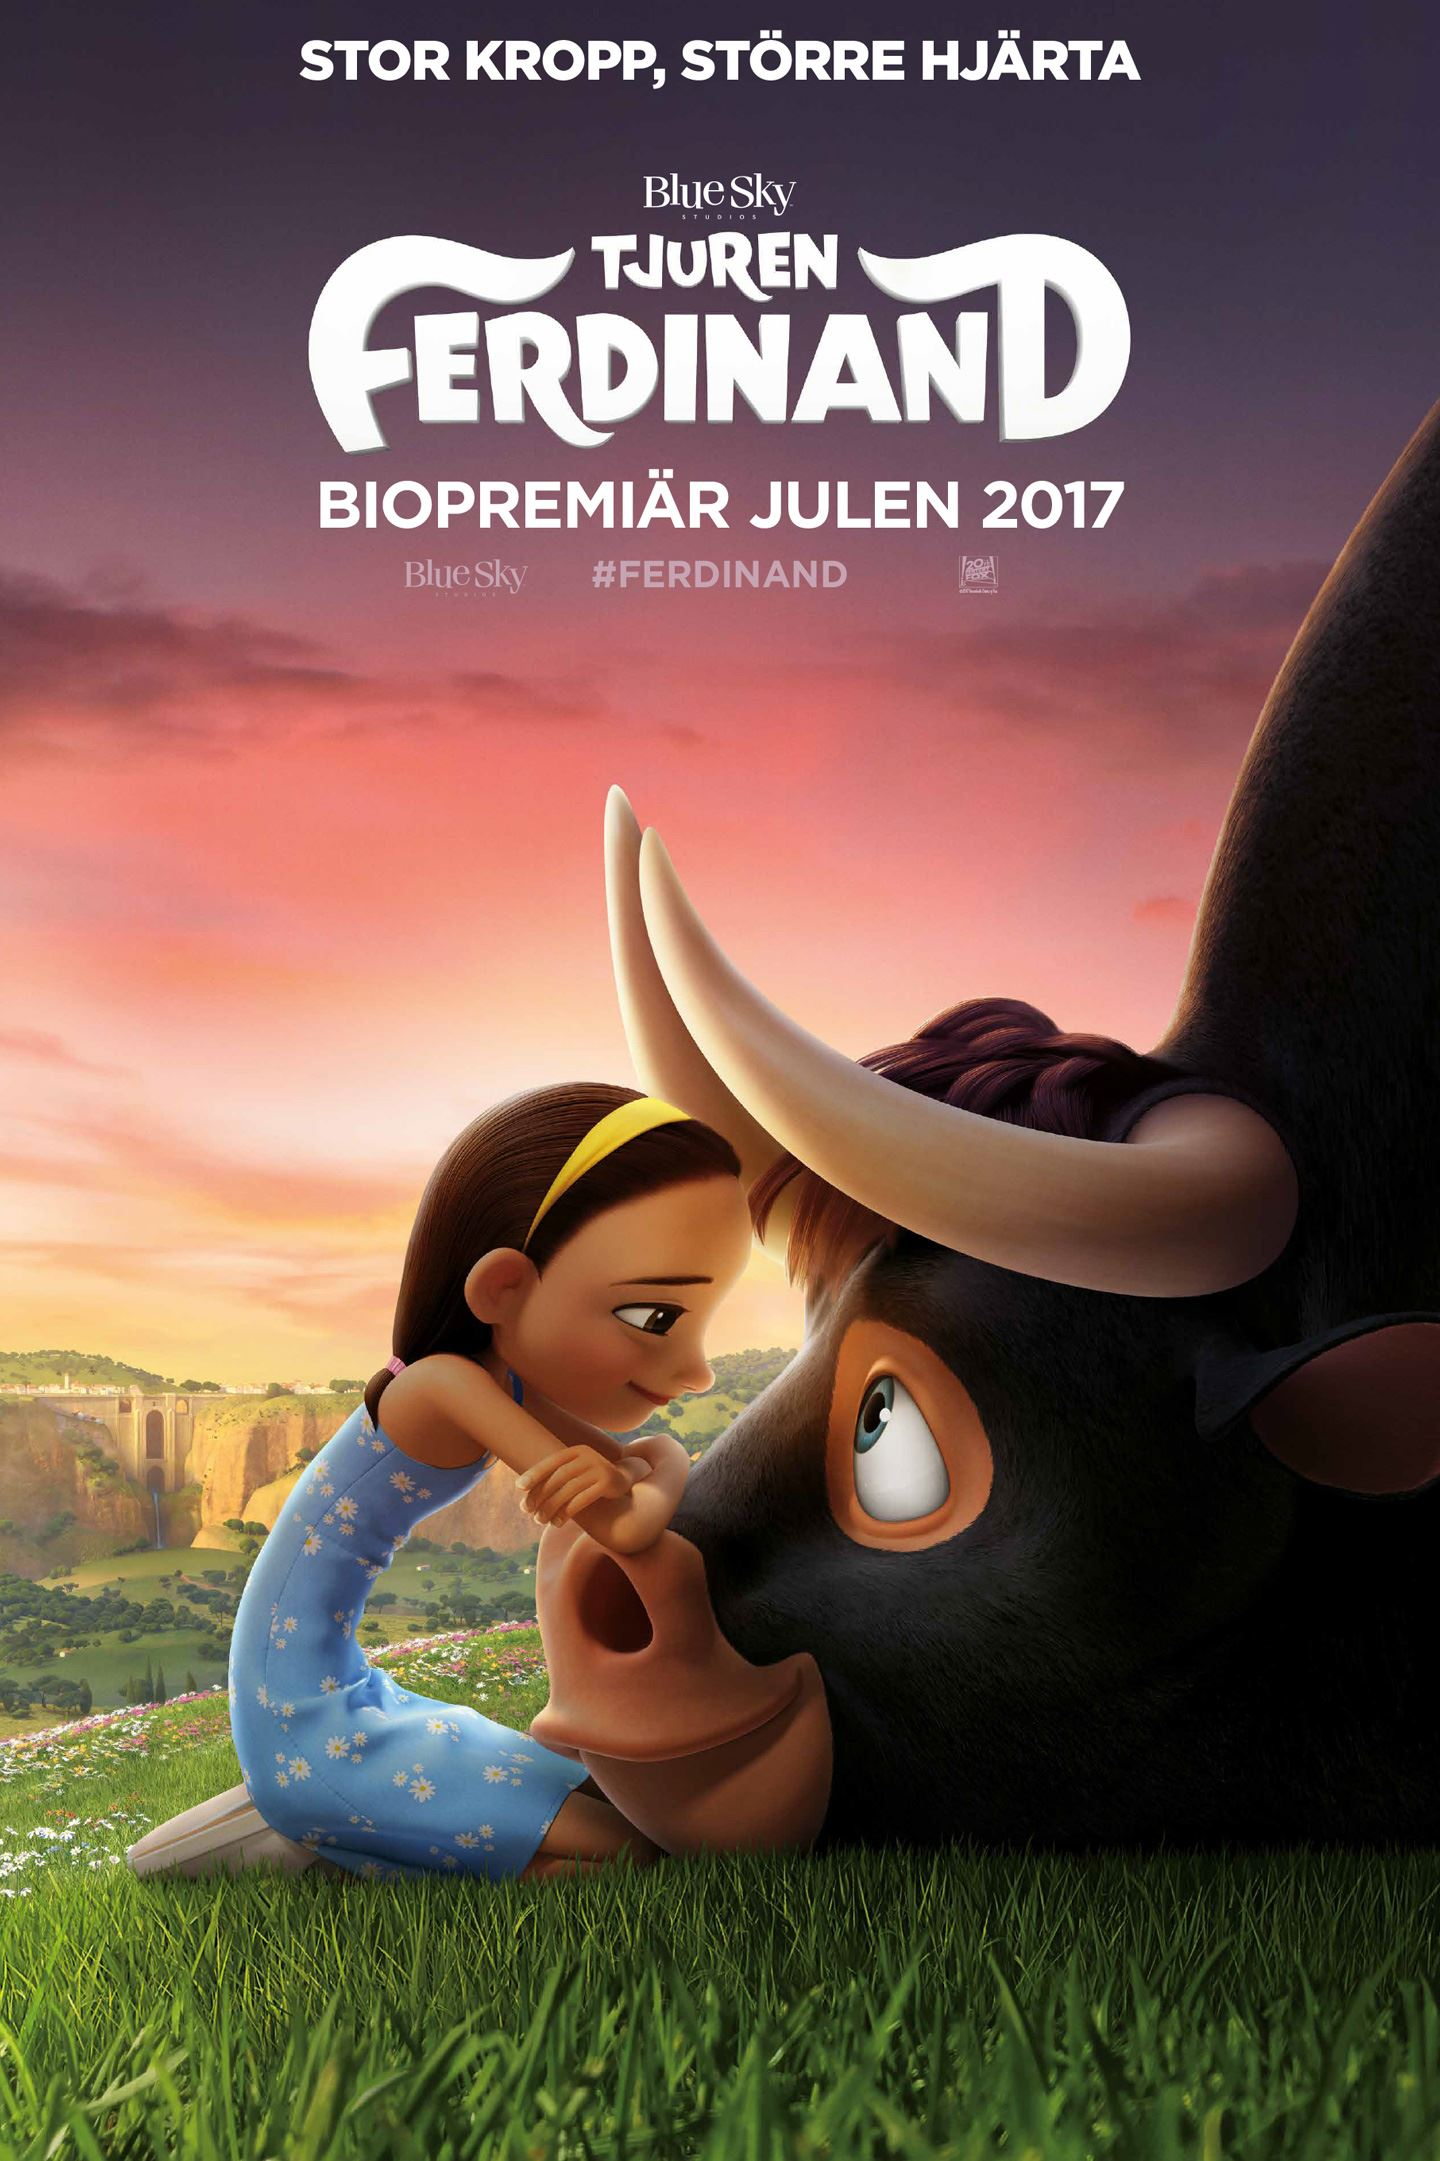 Bio: Ferdinand